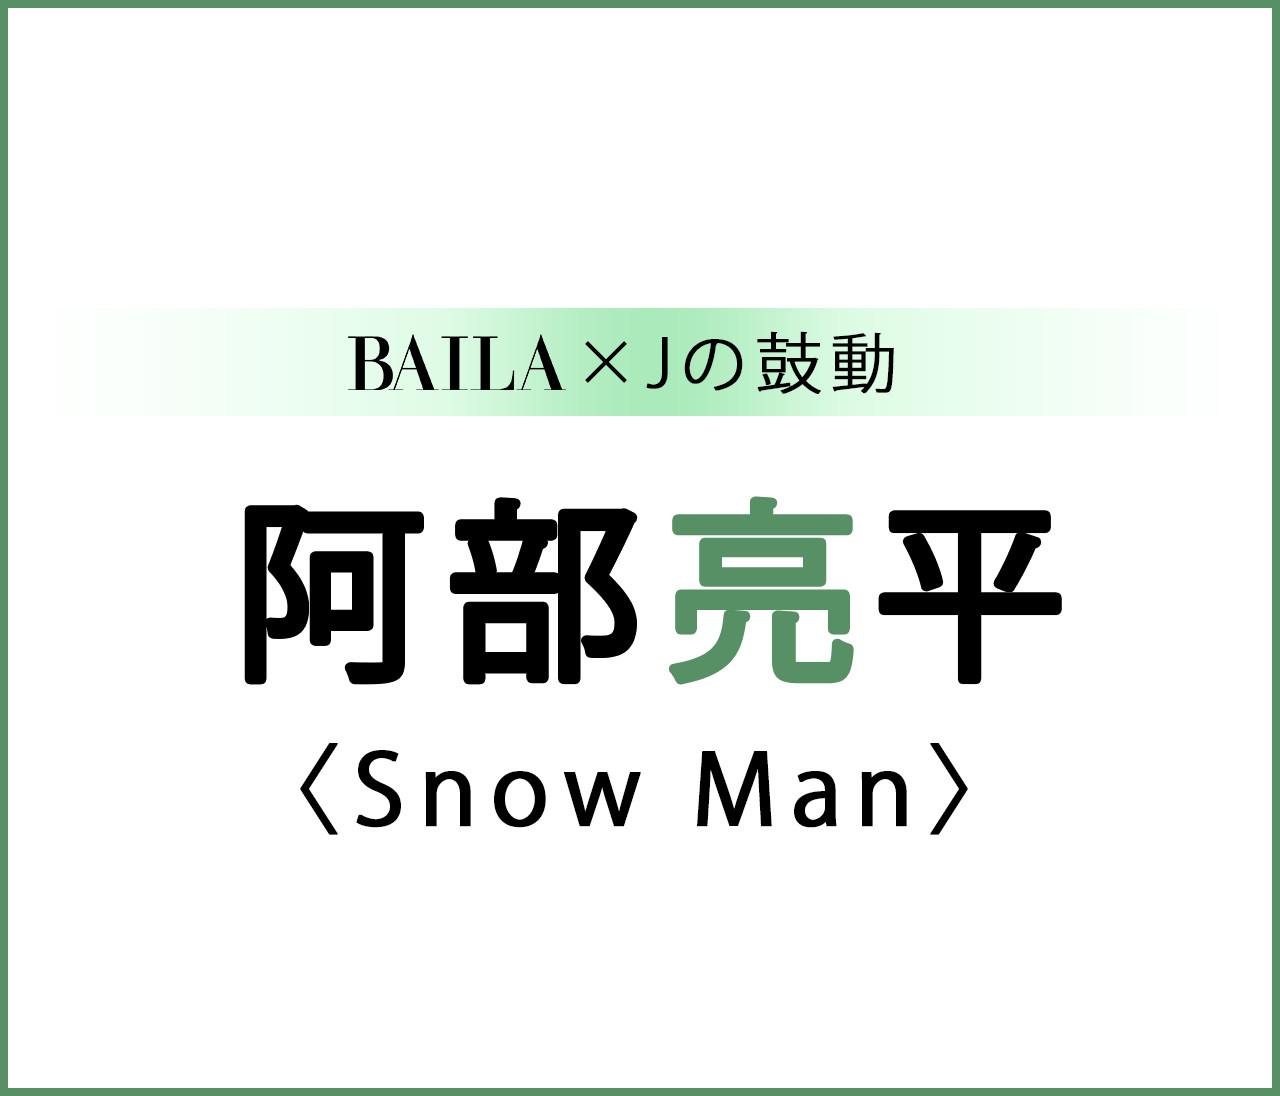 【 #SnowMan #阿部亮平 】阿部亮平スペシャルインタビュー!【BAILA × Jの鼓動】